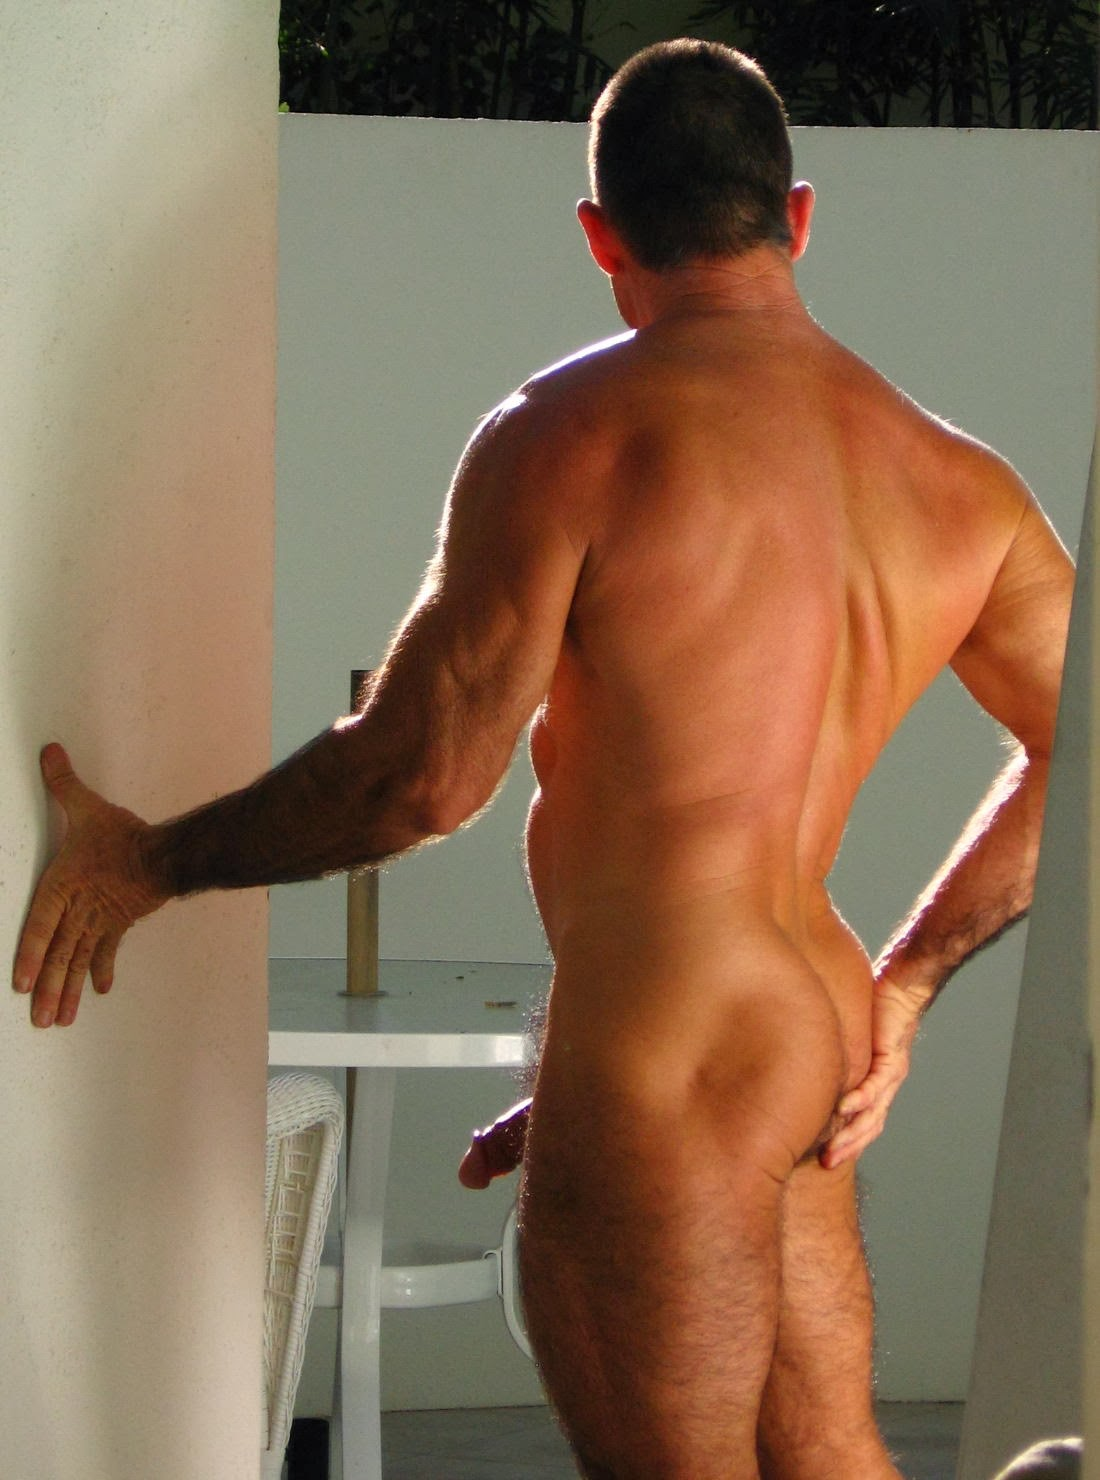 Naked Sports Men  Hot Girl Hd Wallpaper-5136